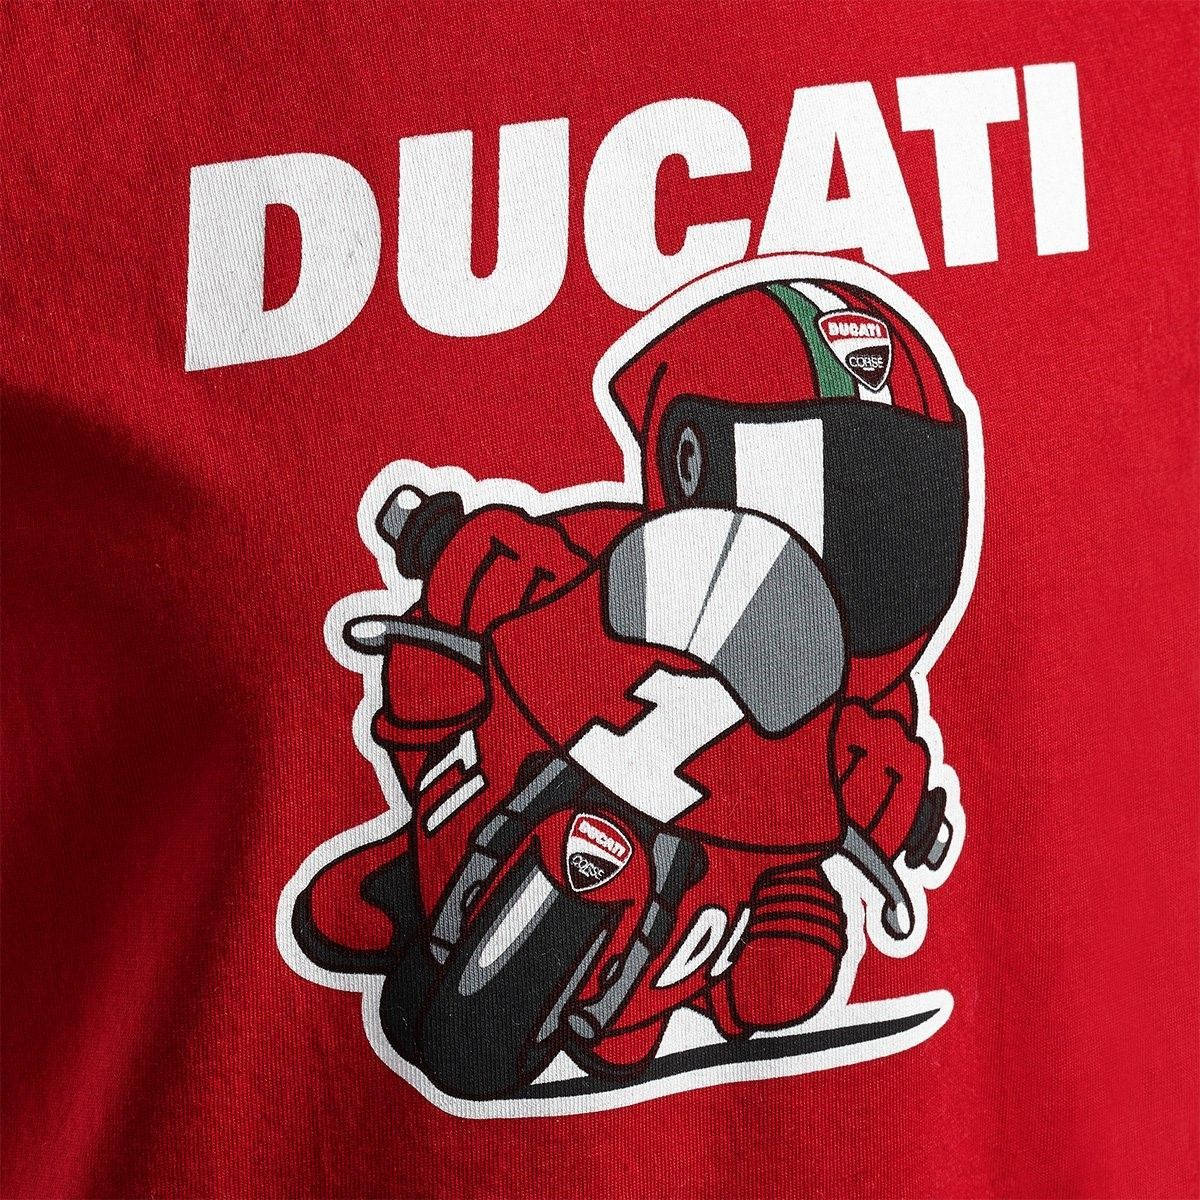 【DUCATI performance】Childrens Little Pilot T恤 - 「Webike-摩托百貨」